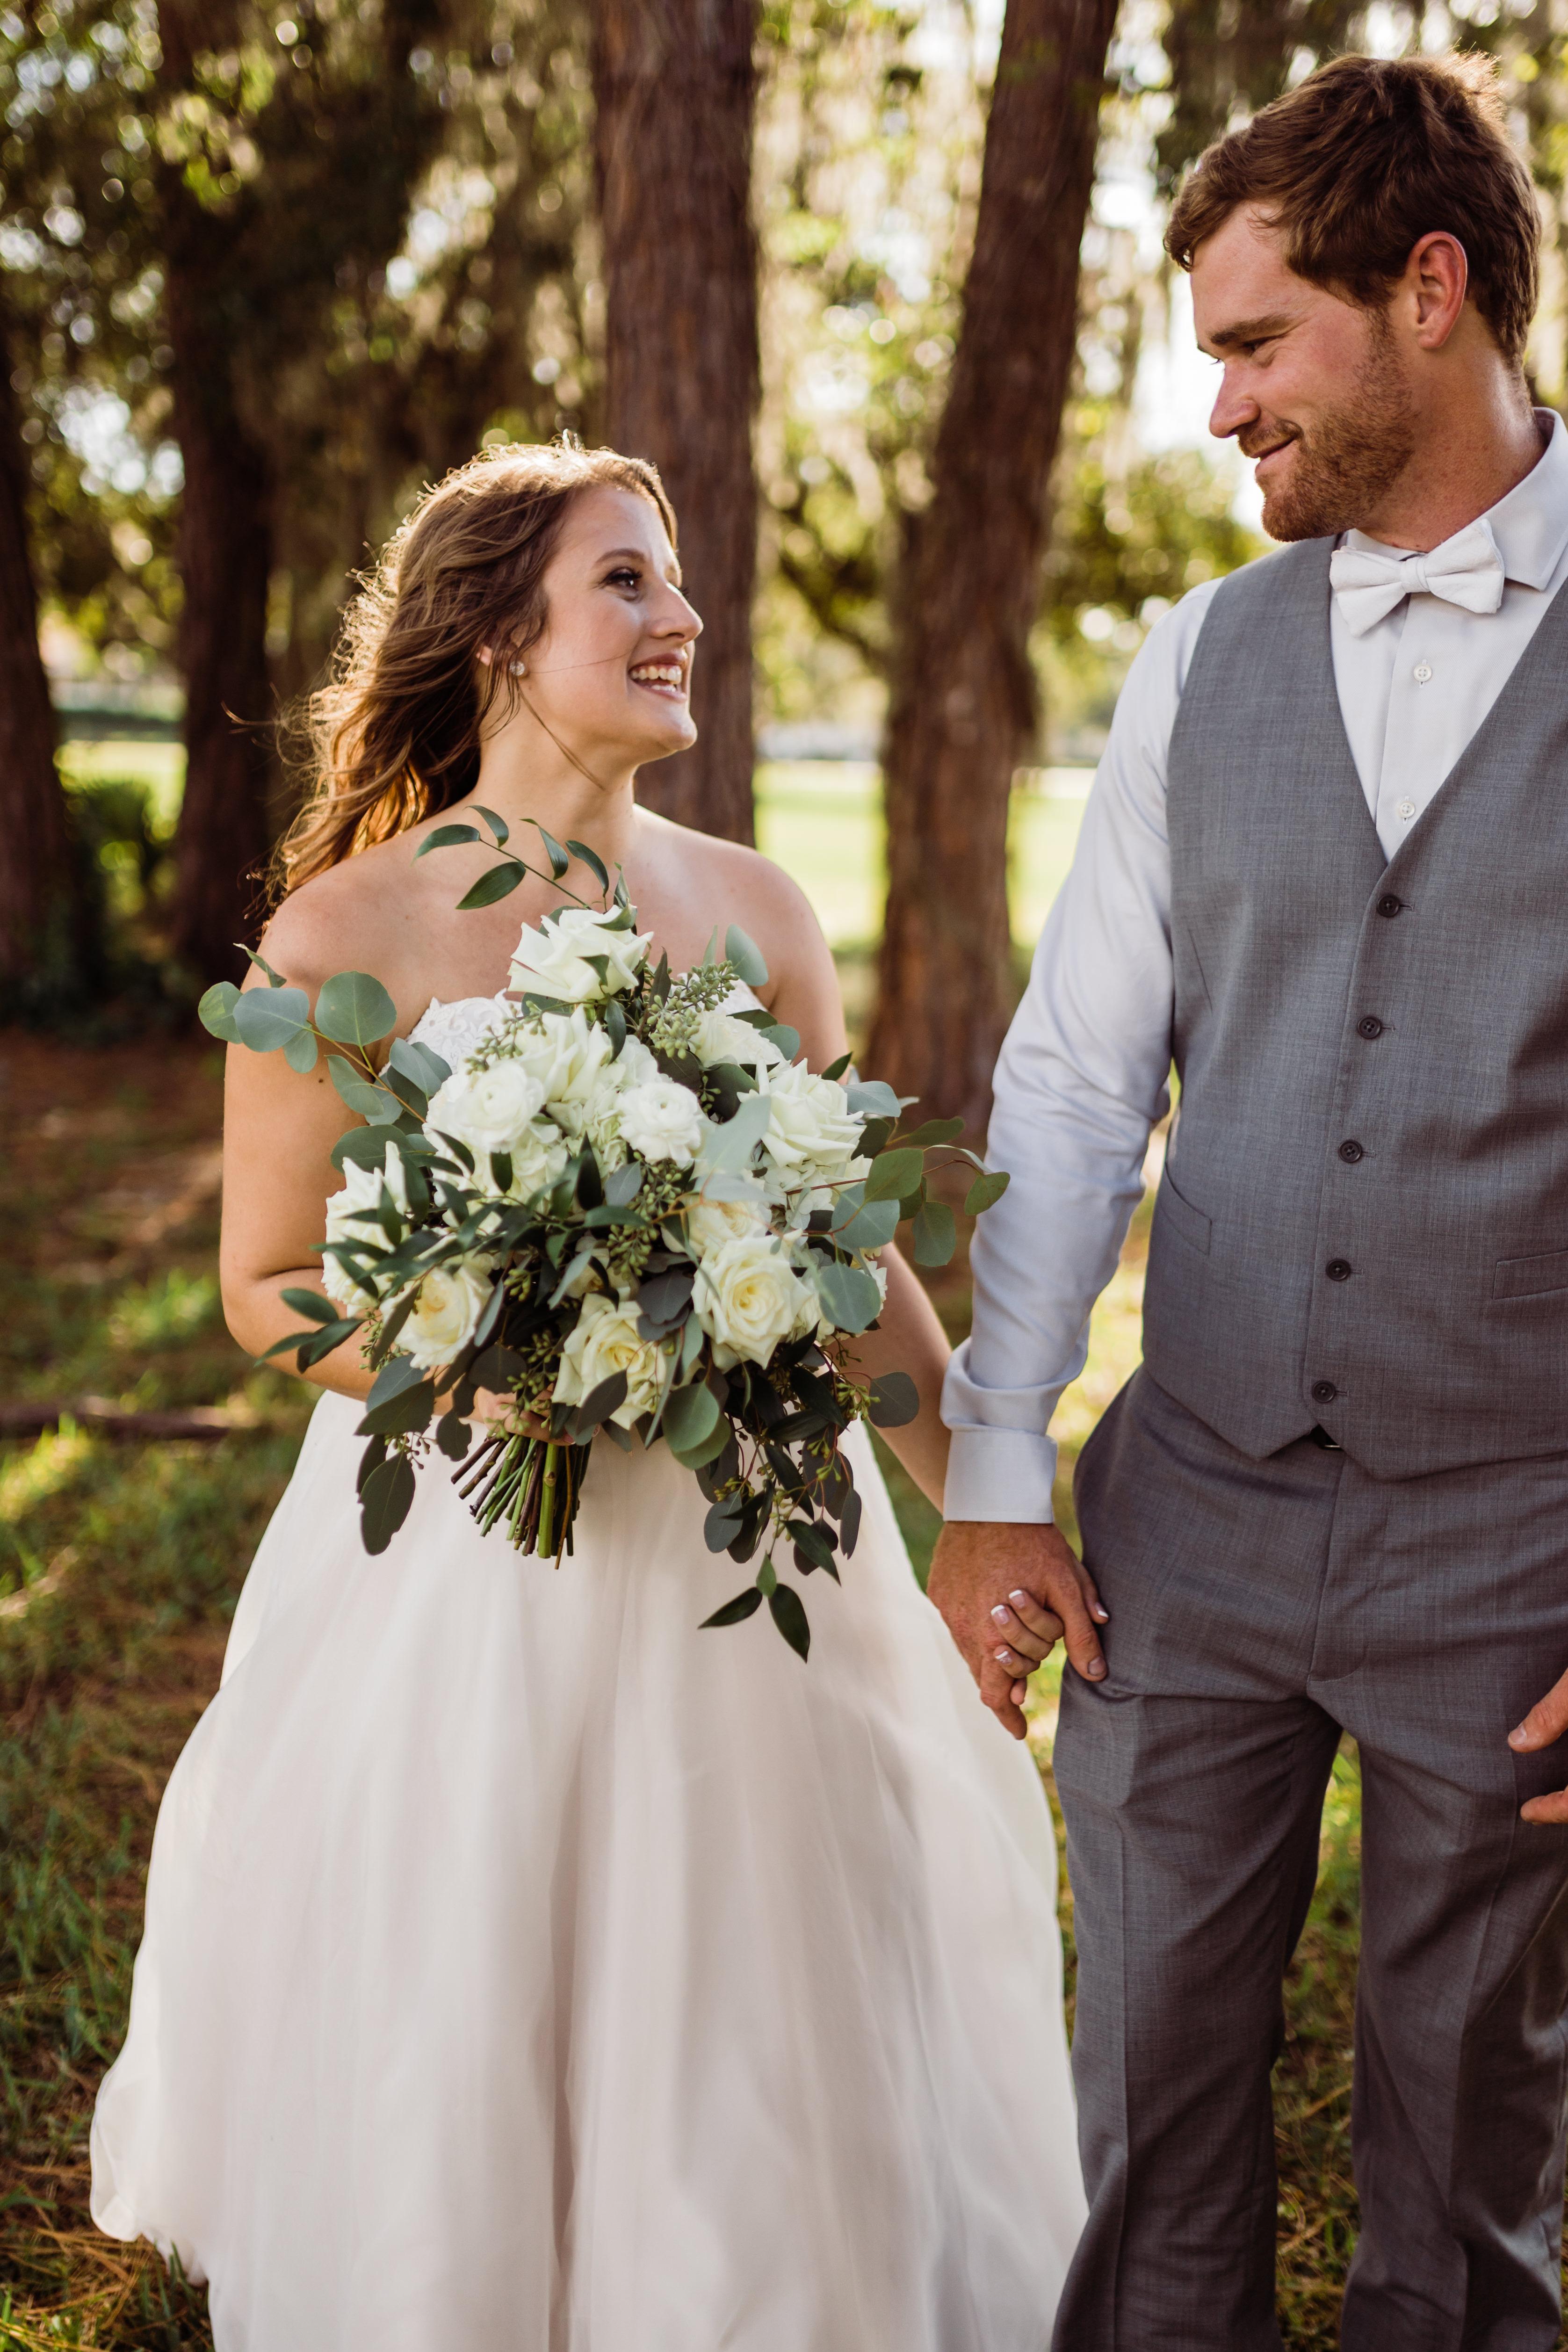 2017.10.14 Samantha and Matthew Crabtree Sarasota Wedding (350 of 708).jpg